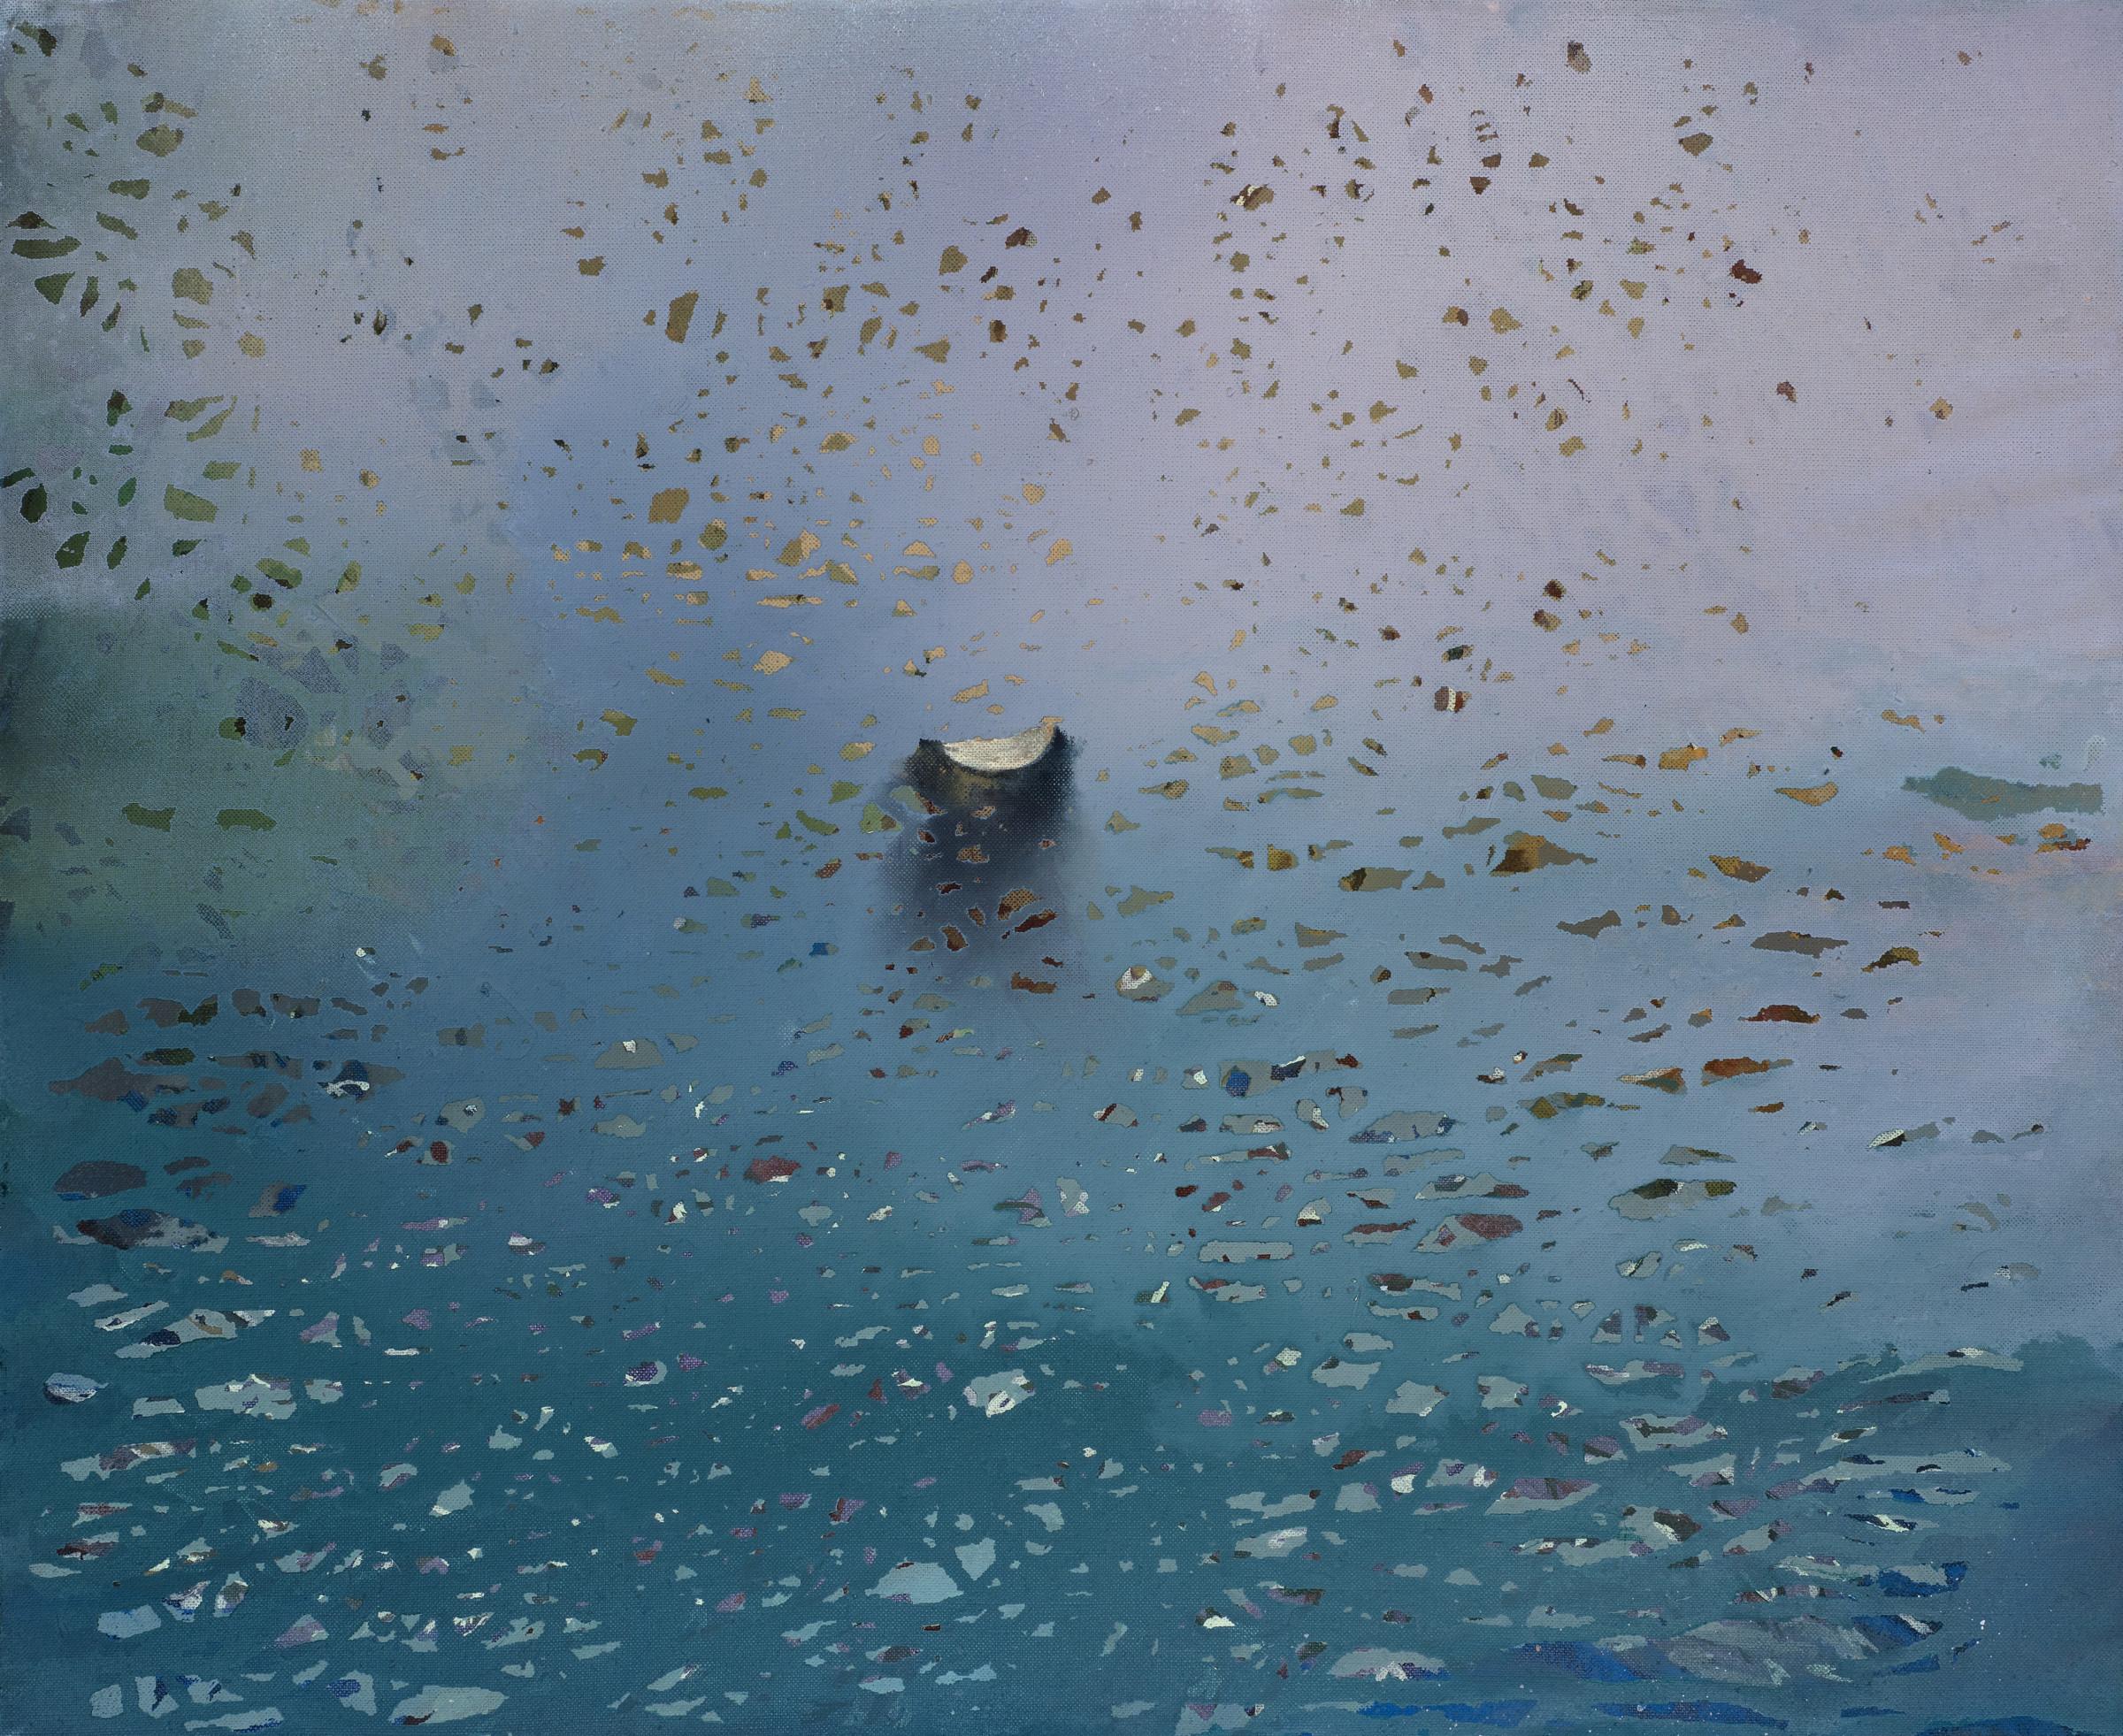 <span class=&#34;link fancybox-details-link&#34;><a href=&#34;/artists/71-luke-elwes/works/885/&#34;>View Detail Page</a></span><div class=&#34;artist&#34;><strong>Luke Elwes</strong></div> b.1961 <div class=&#34;title&#34;><em>Ganga Study 1 </em>, 2018</div> <div class=&#34;signed_and_dated&#34;>signed and dated verso </div> <div class=&#34;medium&#34;>oil on canvas</div> <div class=&#34;dimensions&#34;>46 x 57cm</div><div class=&#34;copyright_line&#34;>Copyright the artist</div>